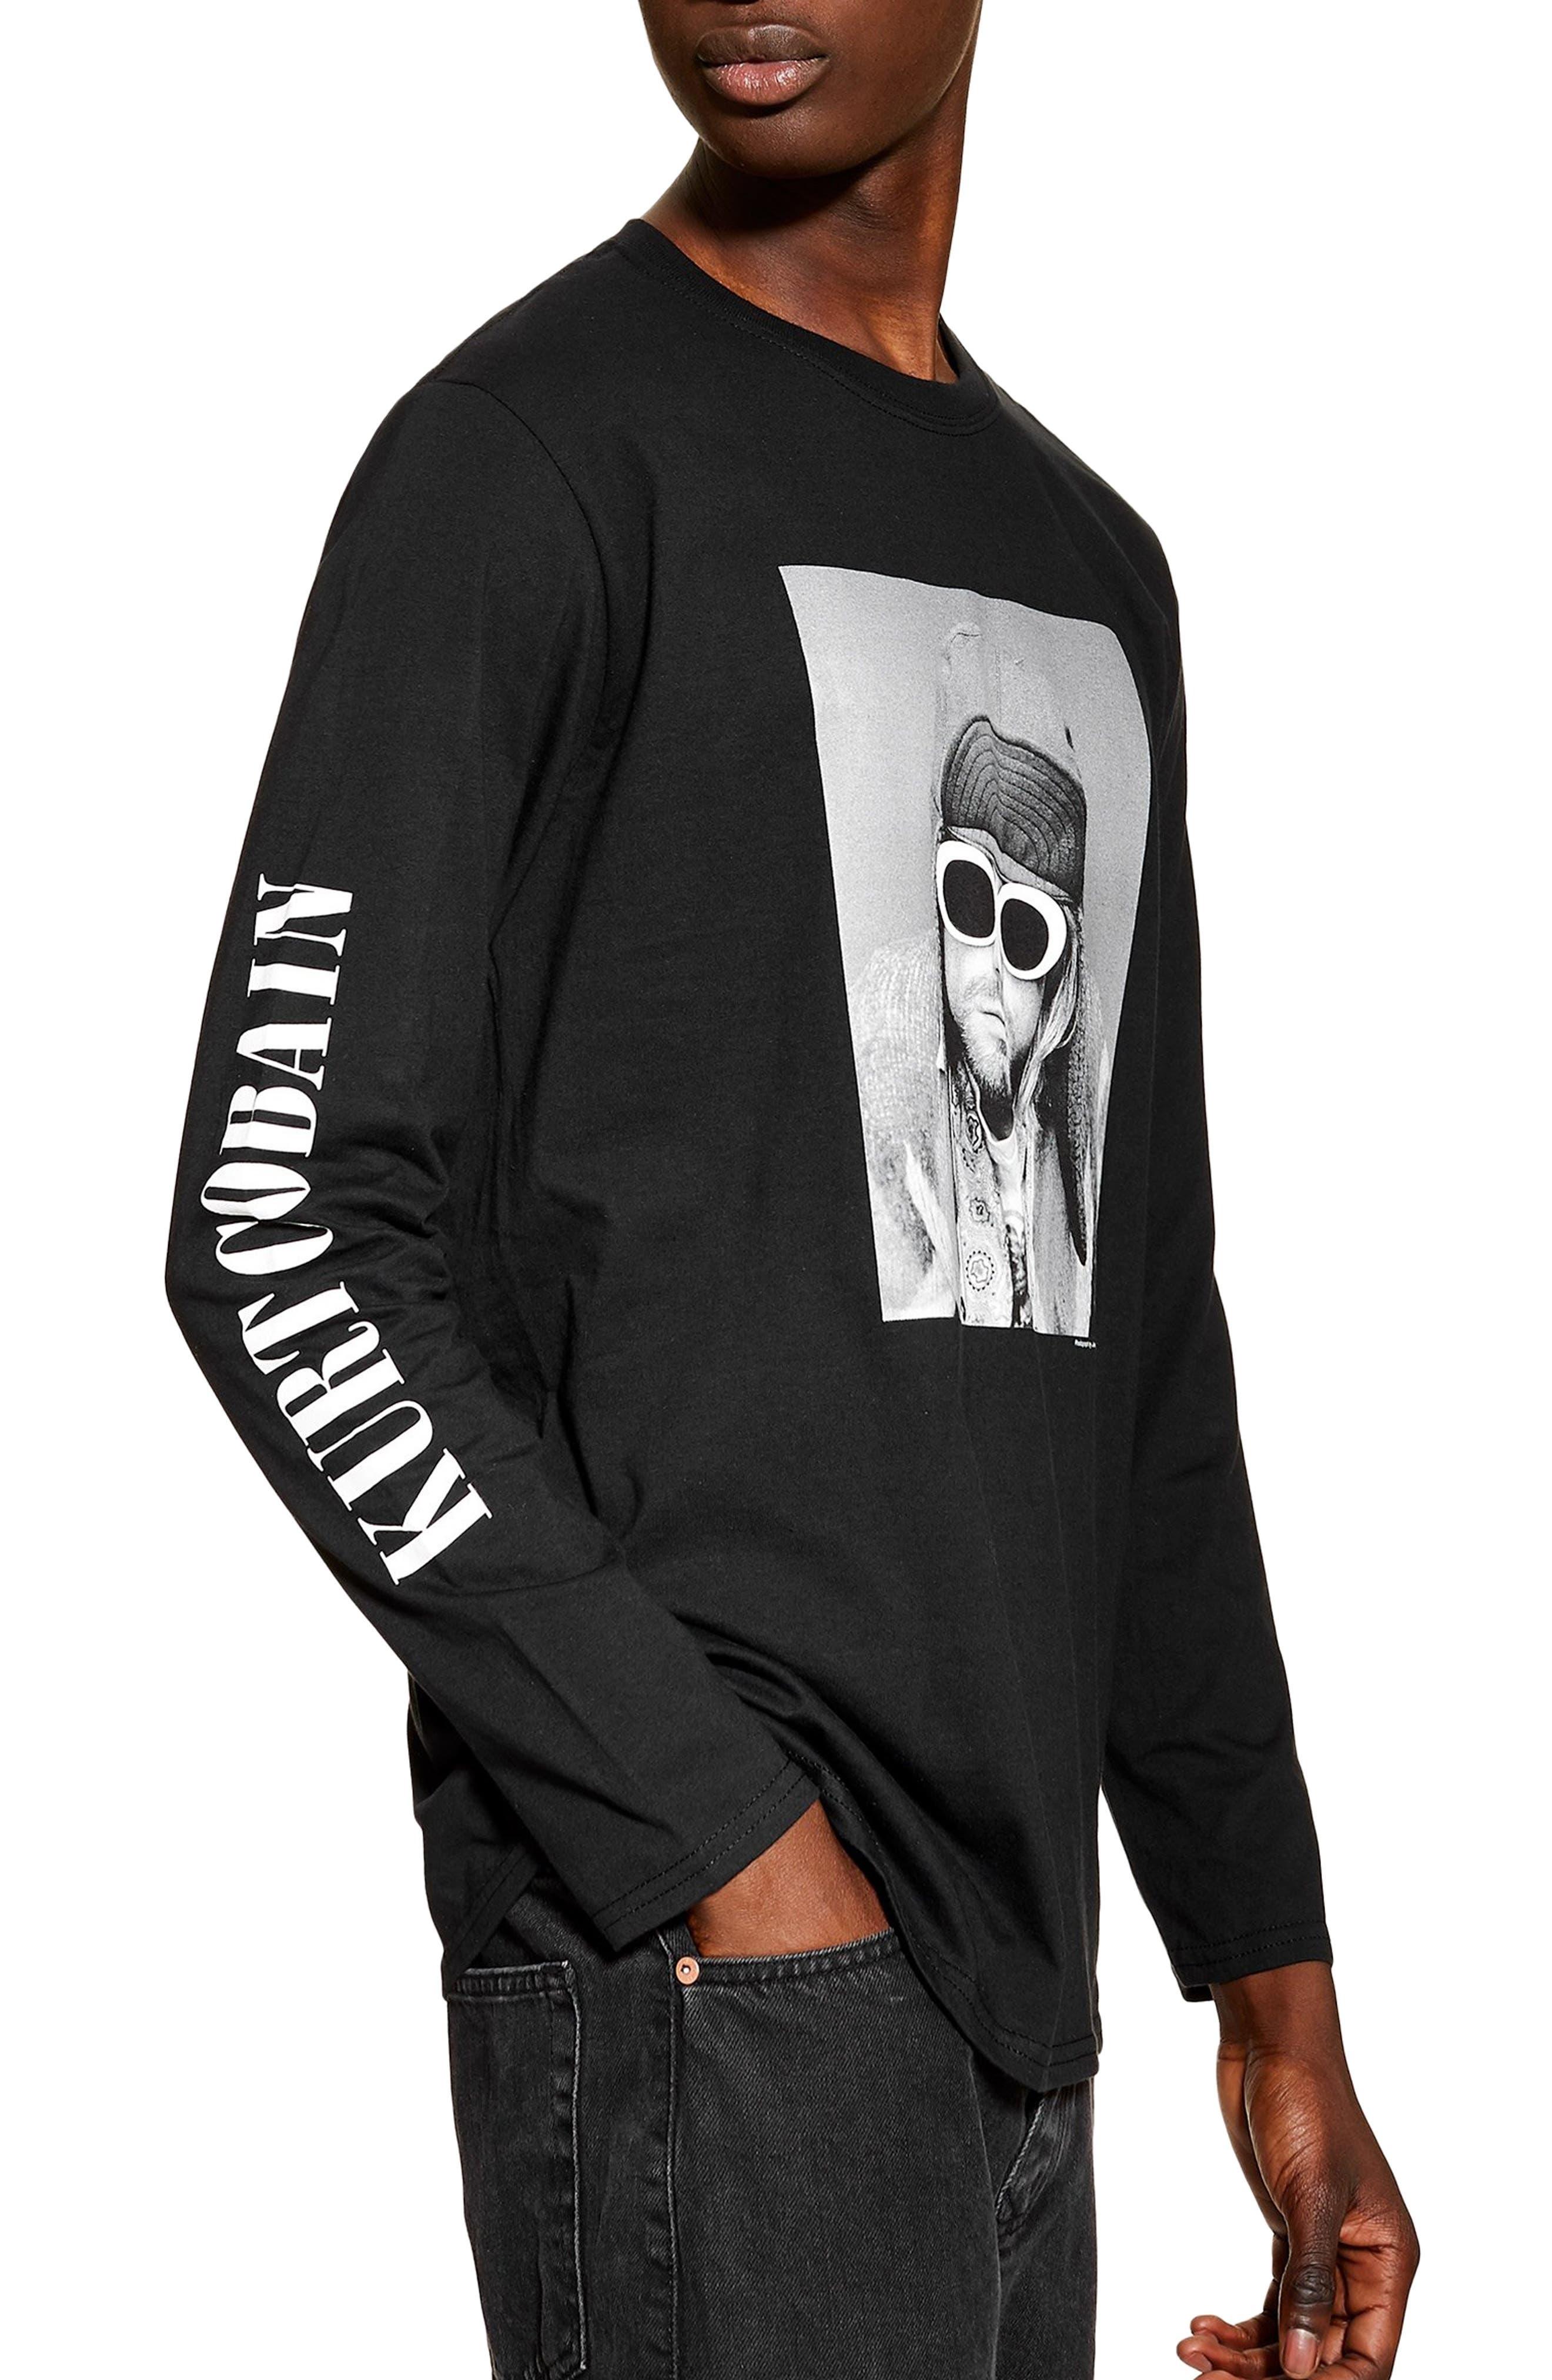 Topman Kurt Cobain Graphic Long Sleeve T-Shirt, Black